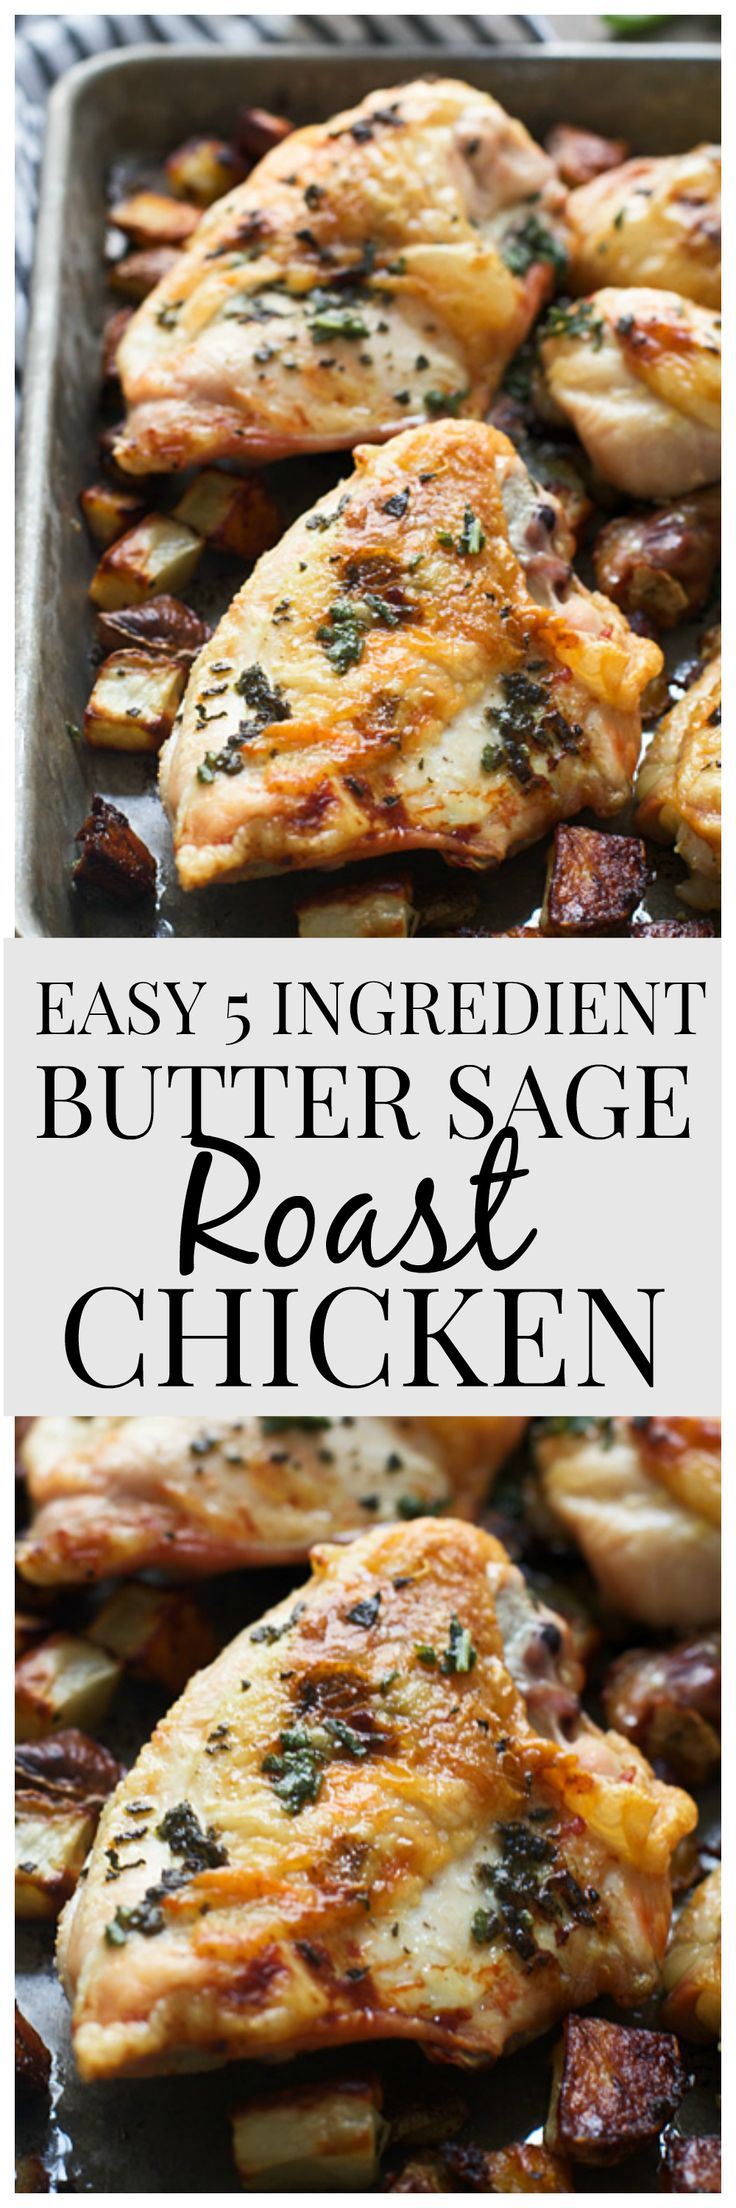 Easy 5 Ingredient Sage Roasted Chicken - Juicy, tender, and crispy, this is the BEST chicken dinner!